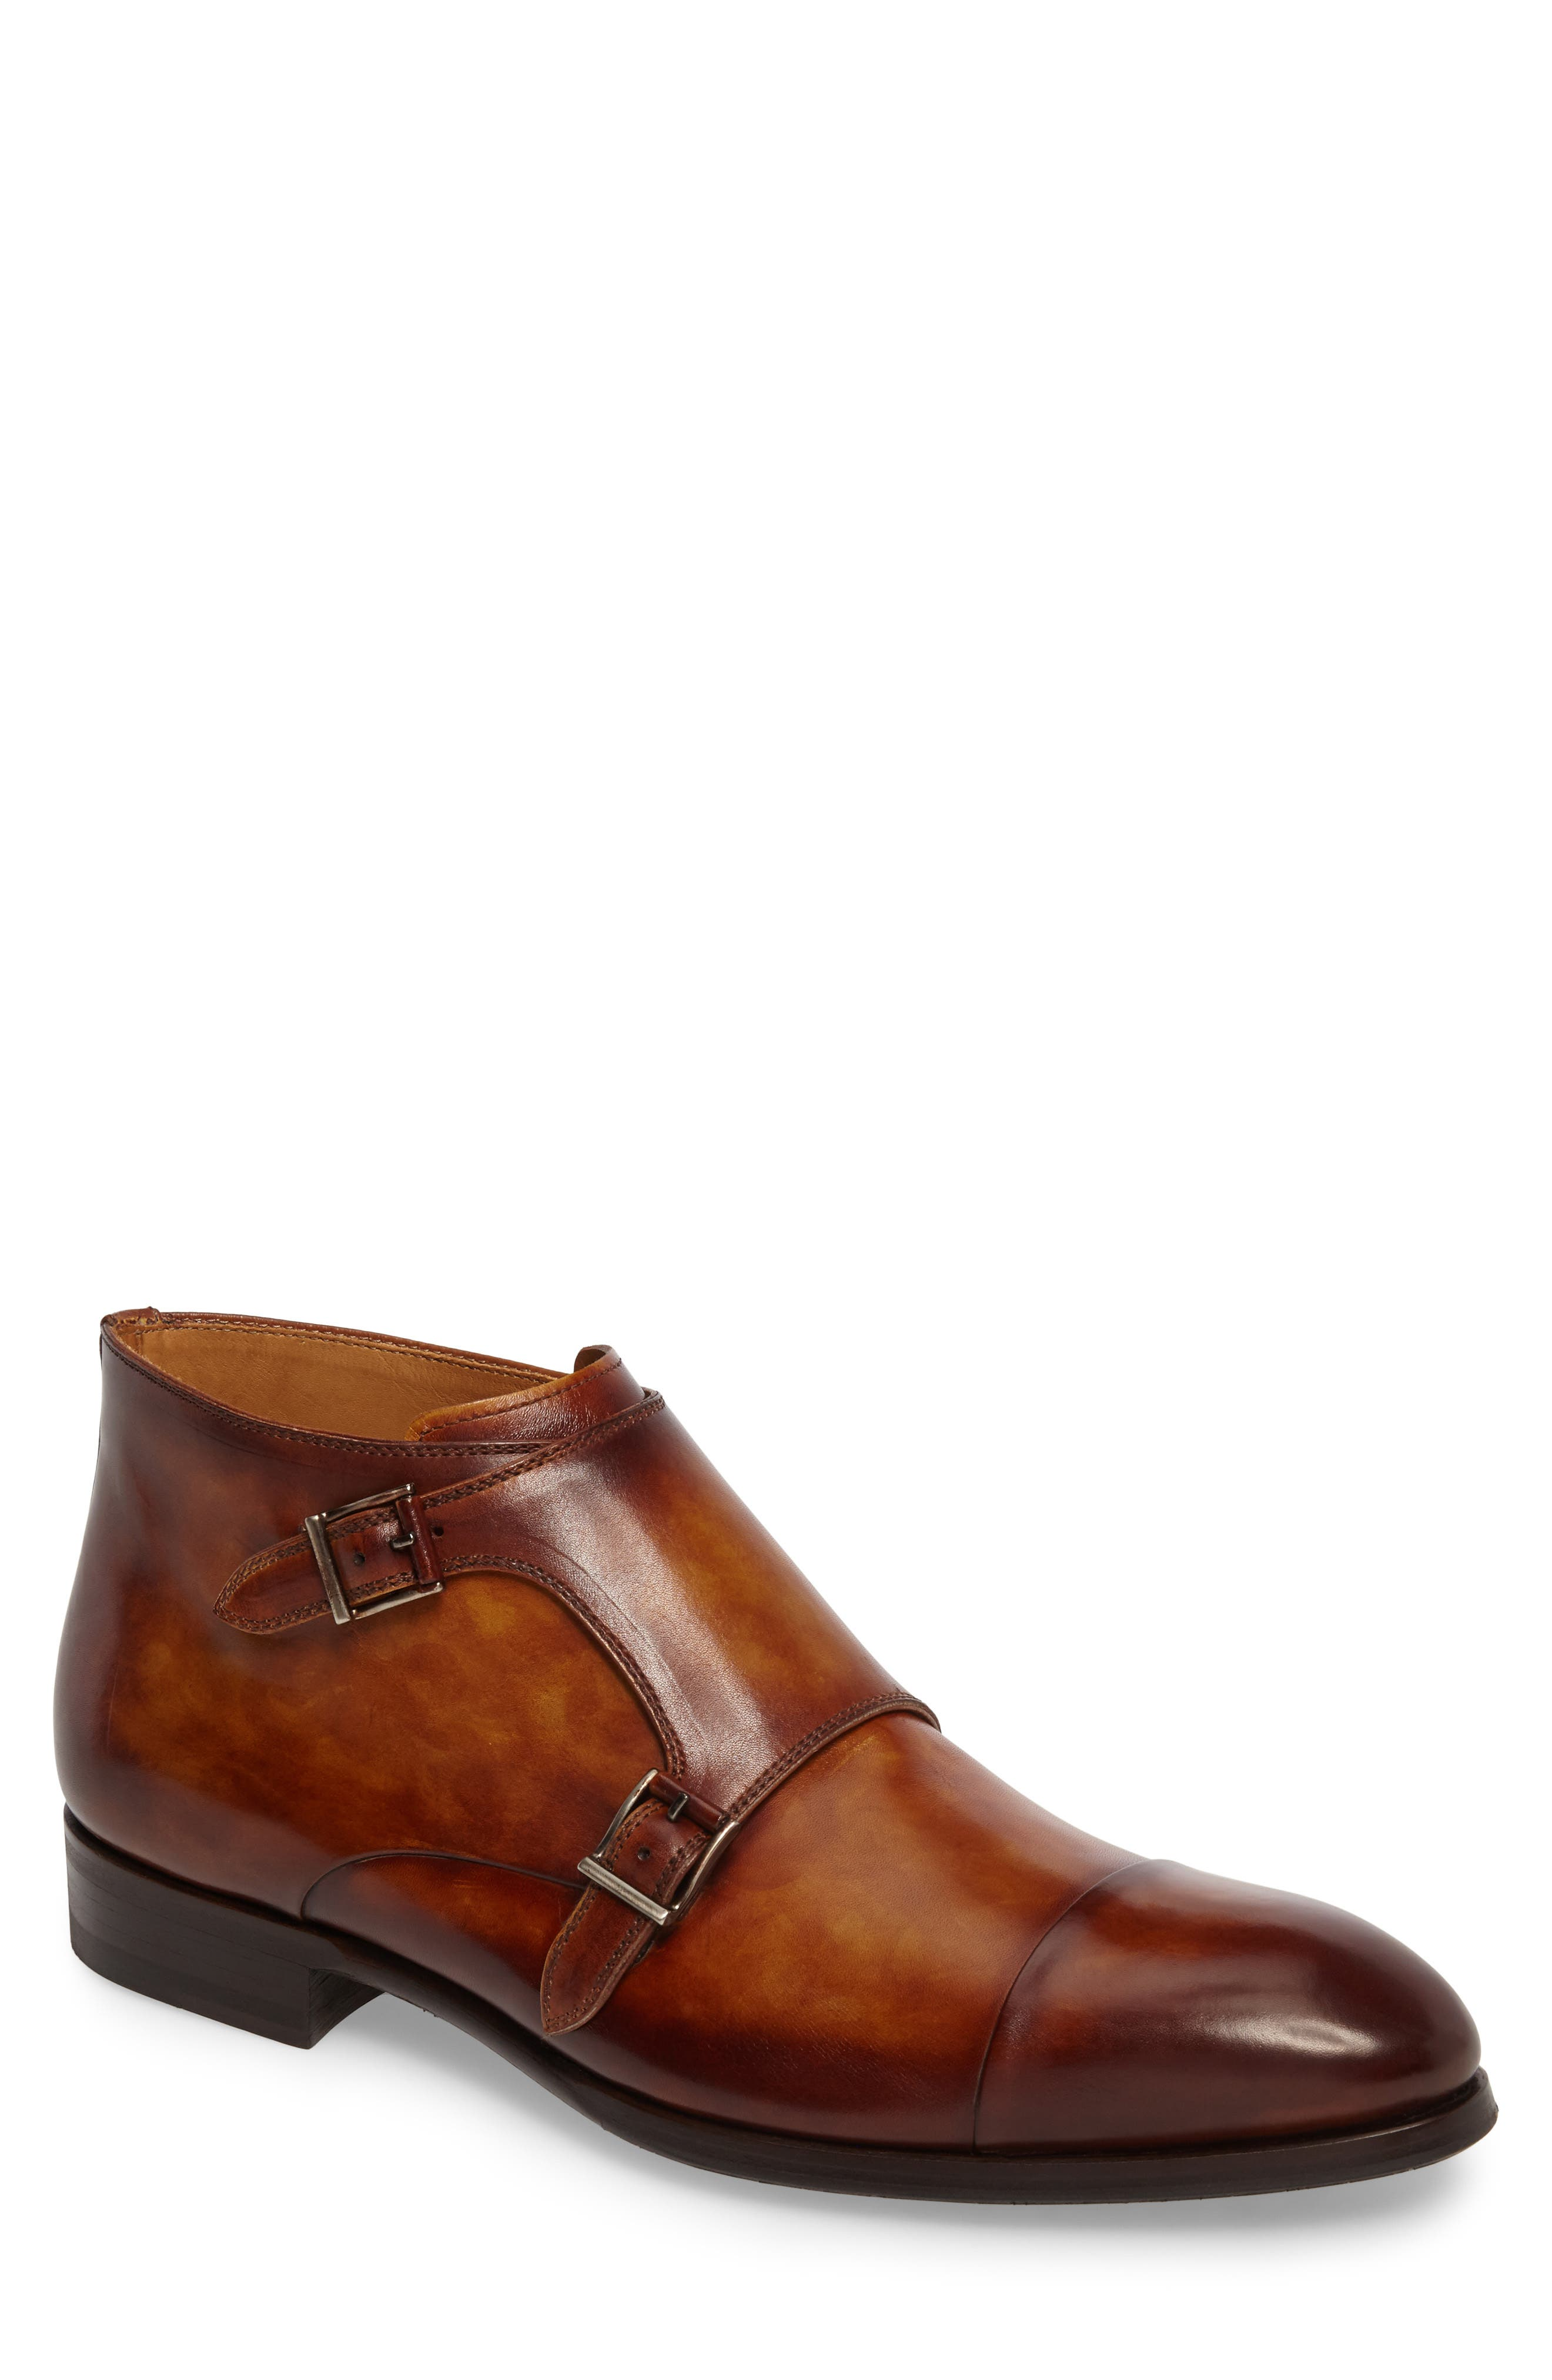 Alternate Image 1 Selected - Magnanni Lavar Double Monk Strap Boot (Men)